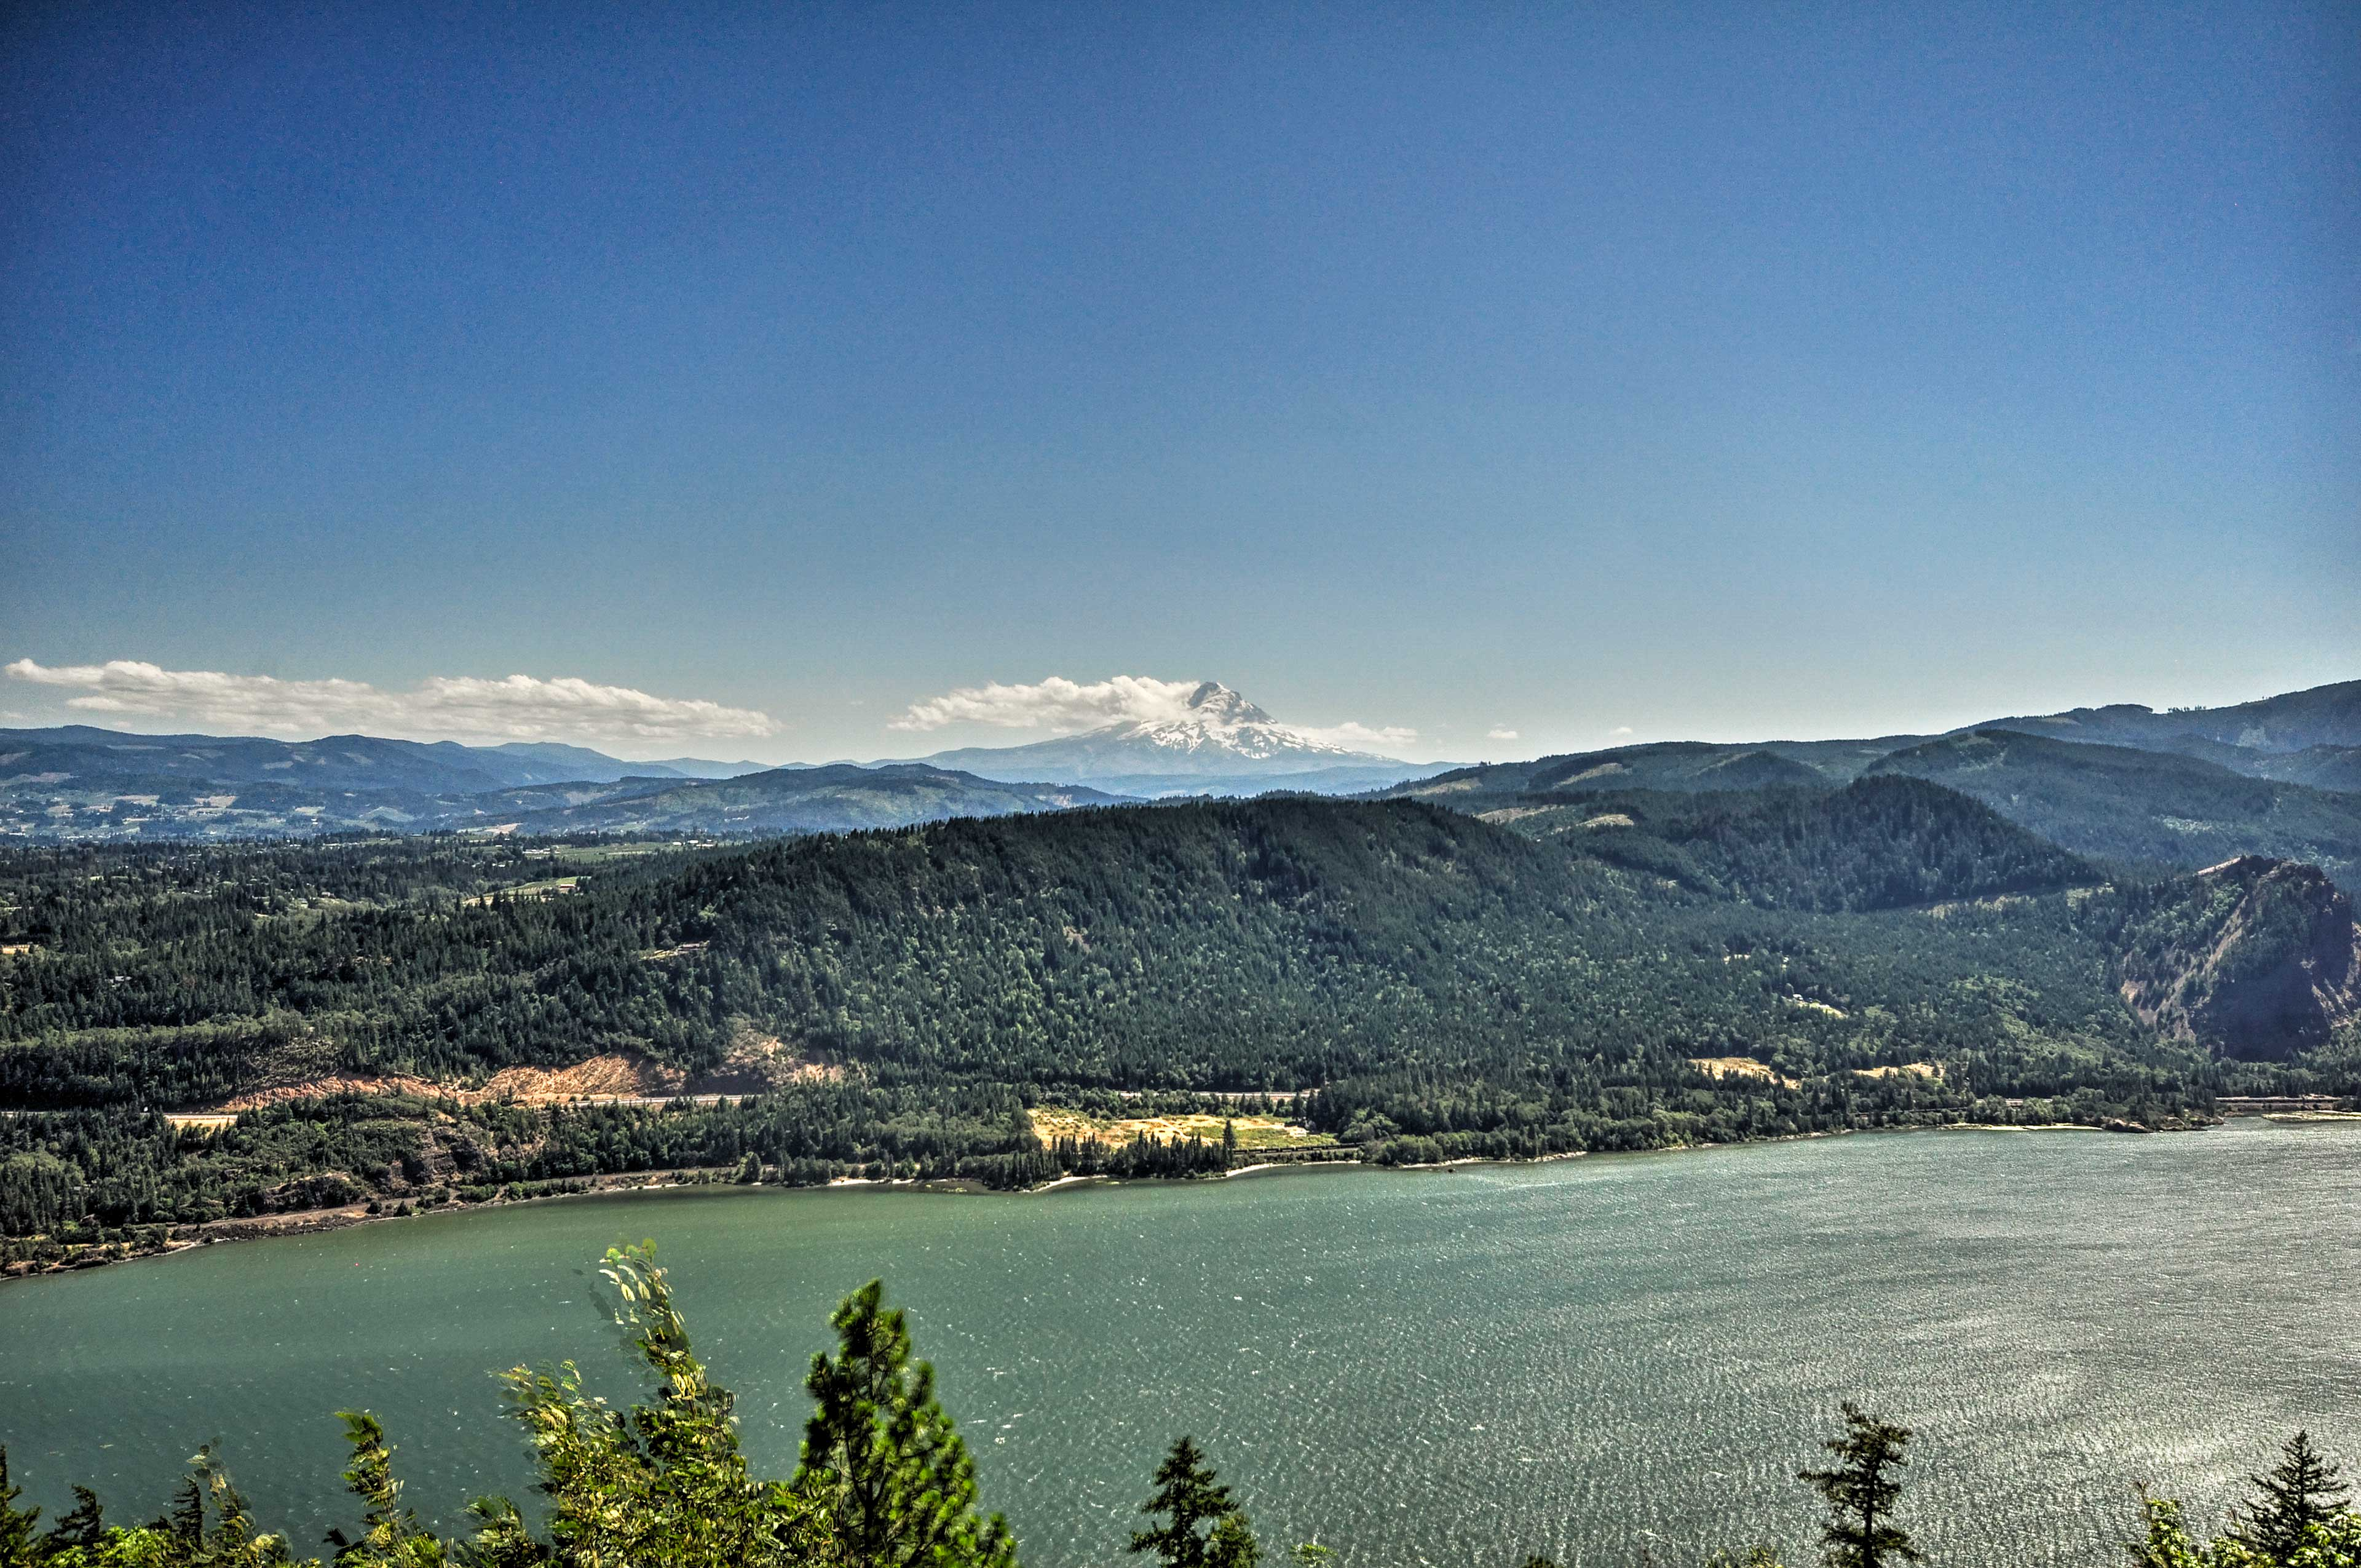 Spend some time admiring the vista!